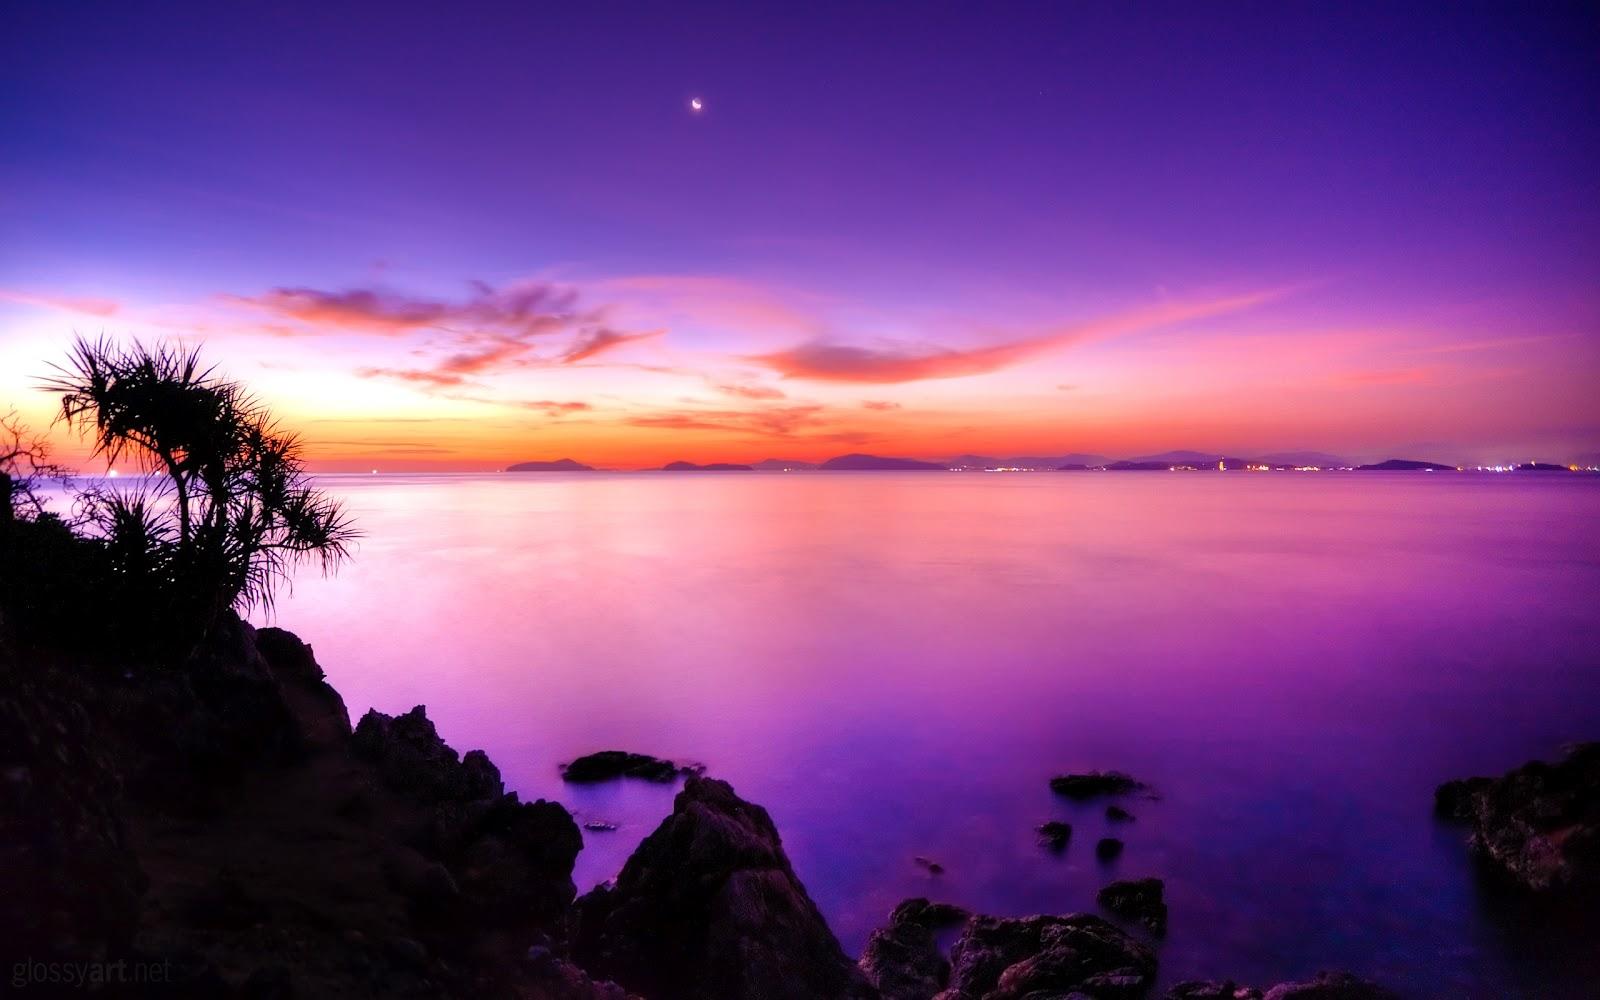 http://4.bp.blogspot.com/-JgvkY6kMNNk/UGsju5Zp-6I/AAAAAAAAGFo/eobZsmaN_Ic/s1600/moonrise_hd.jpg